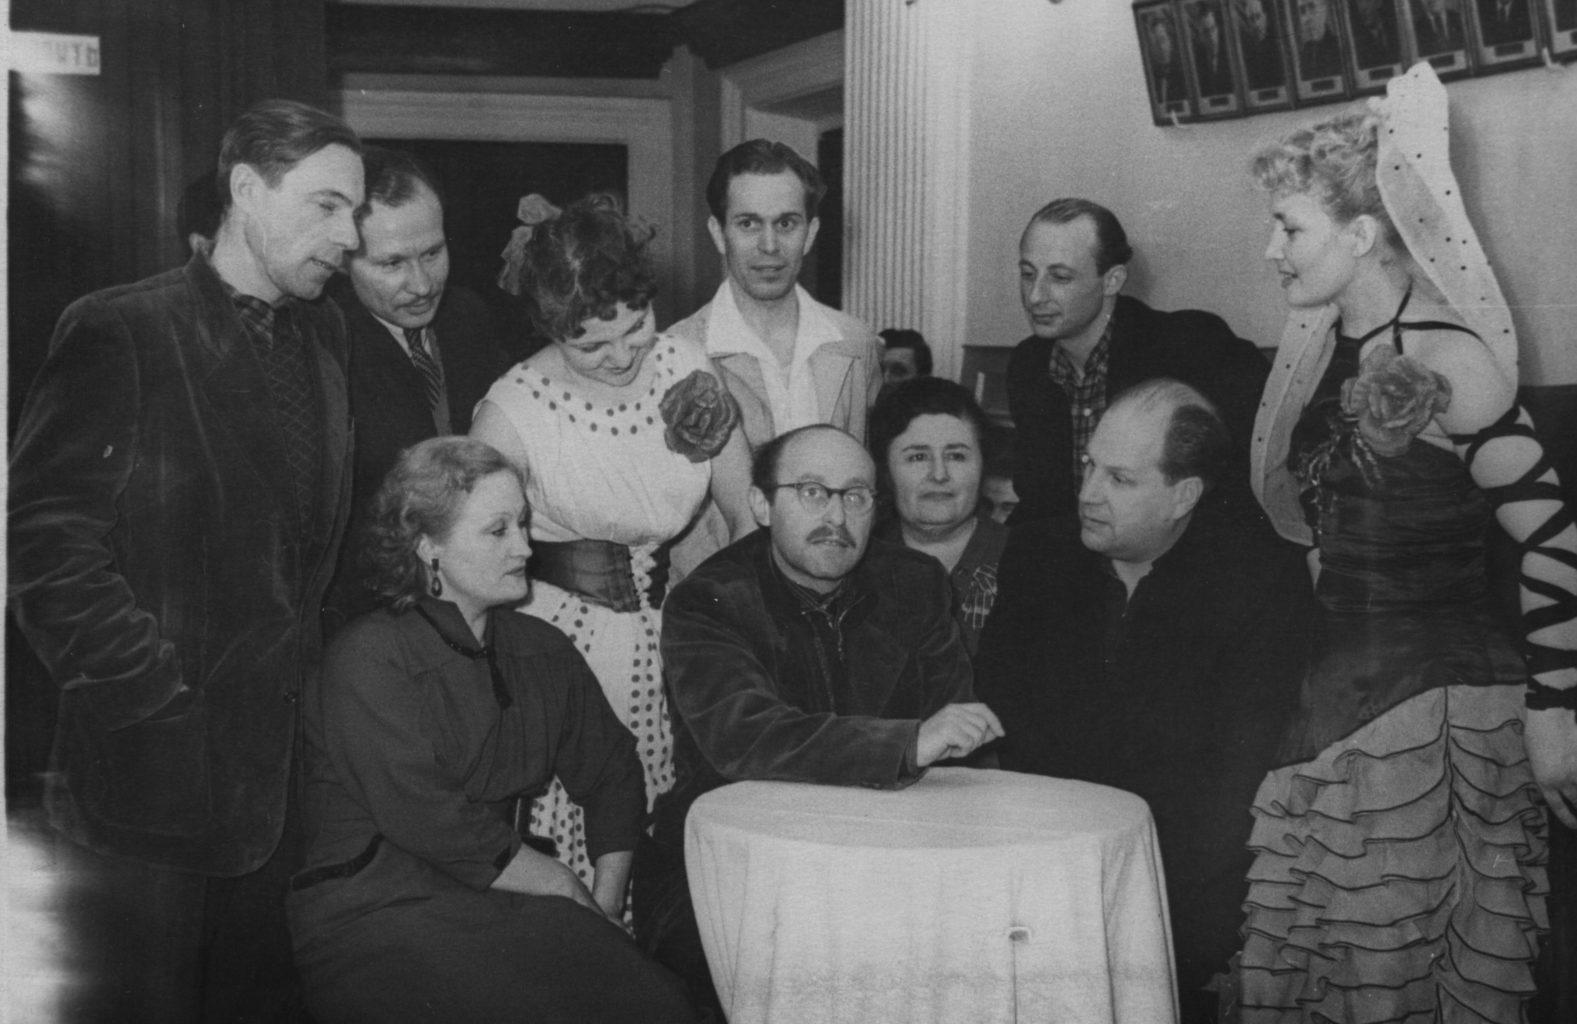 Коллектив театра музкомедии начала 50-х гг.: фотография